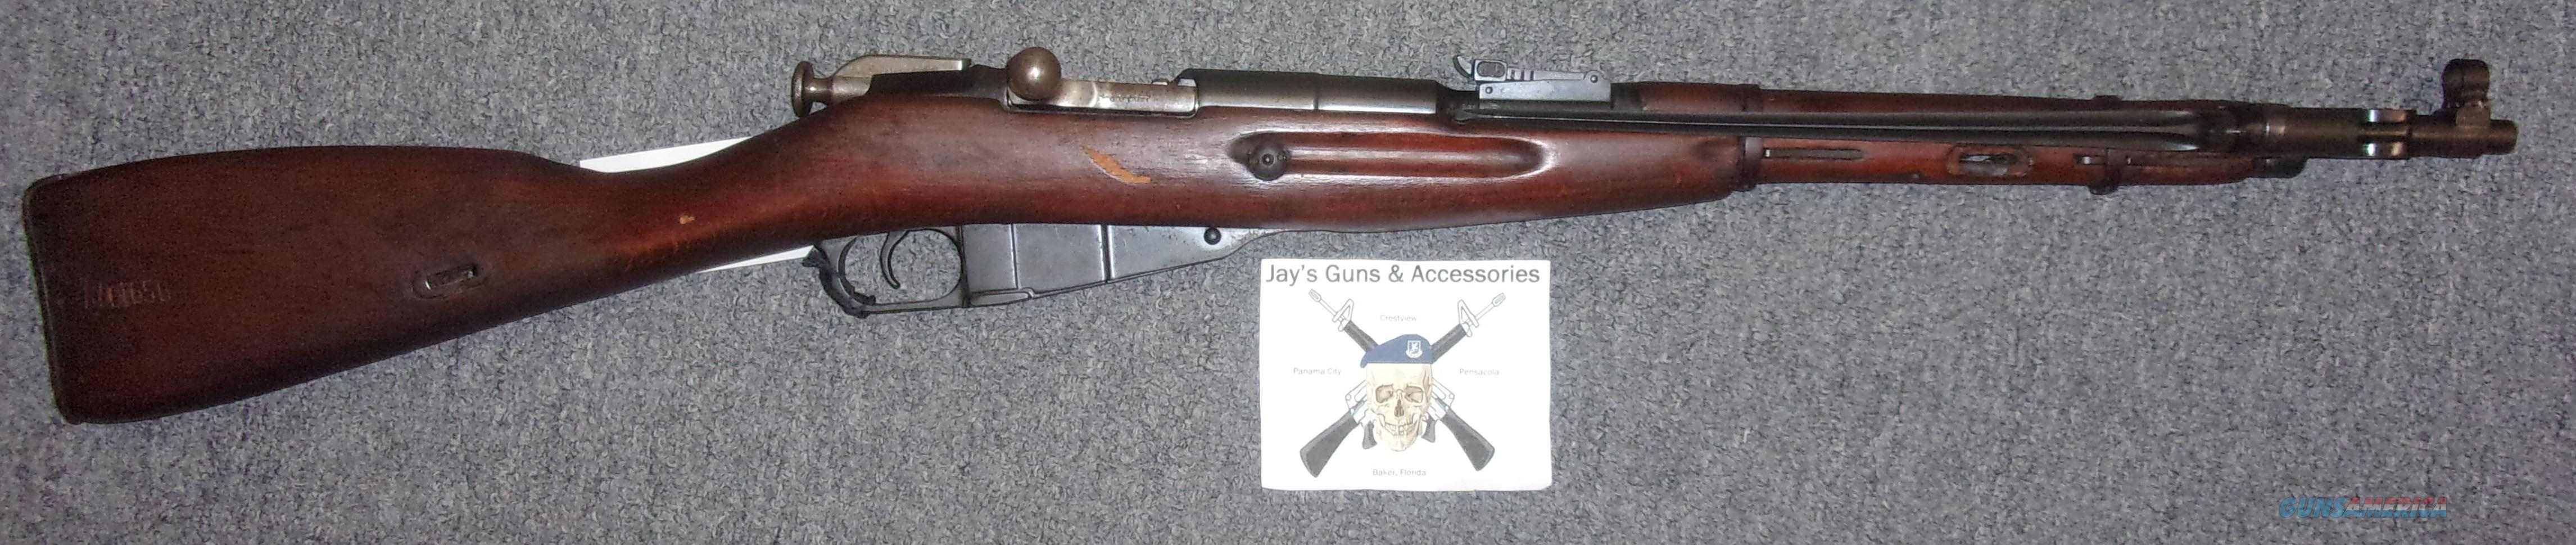 Polish/CAI M44  Guns > Rifles > Military Misc. Rifles Non-US > Other